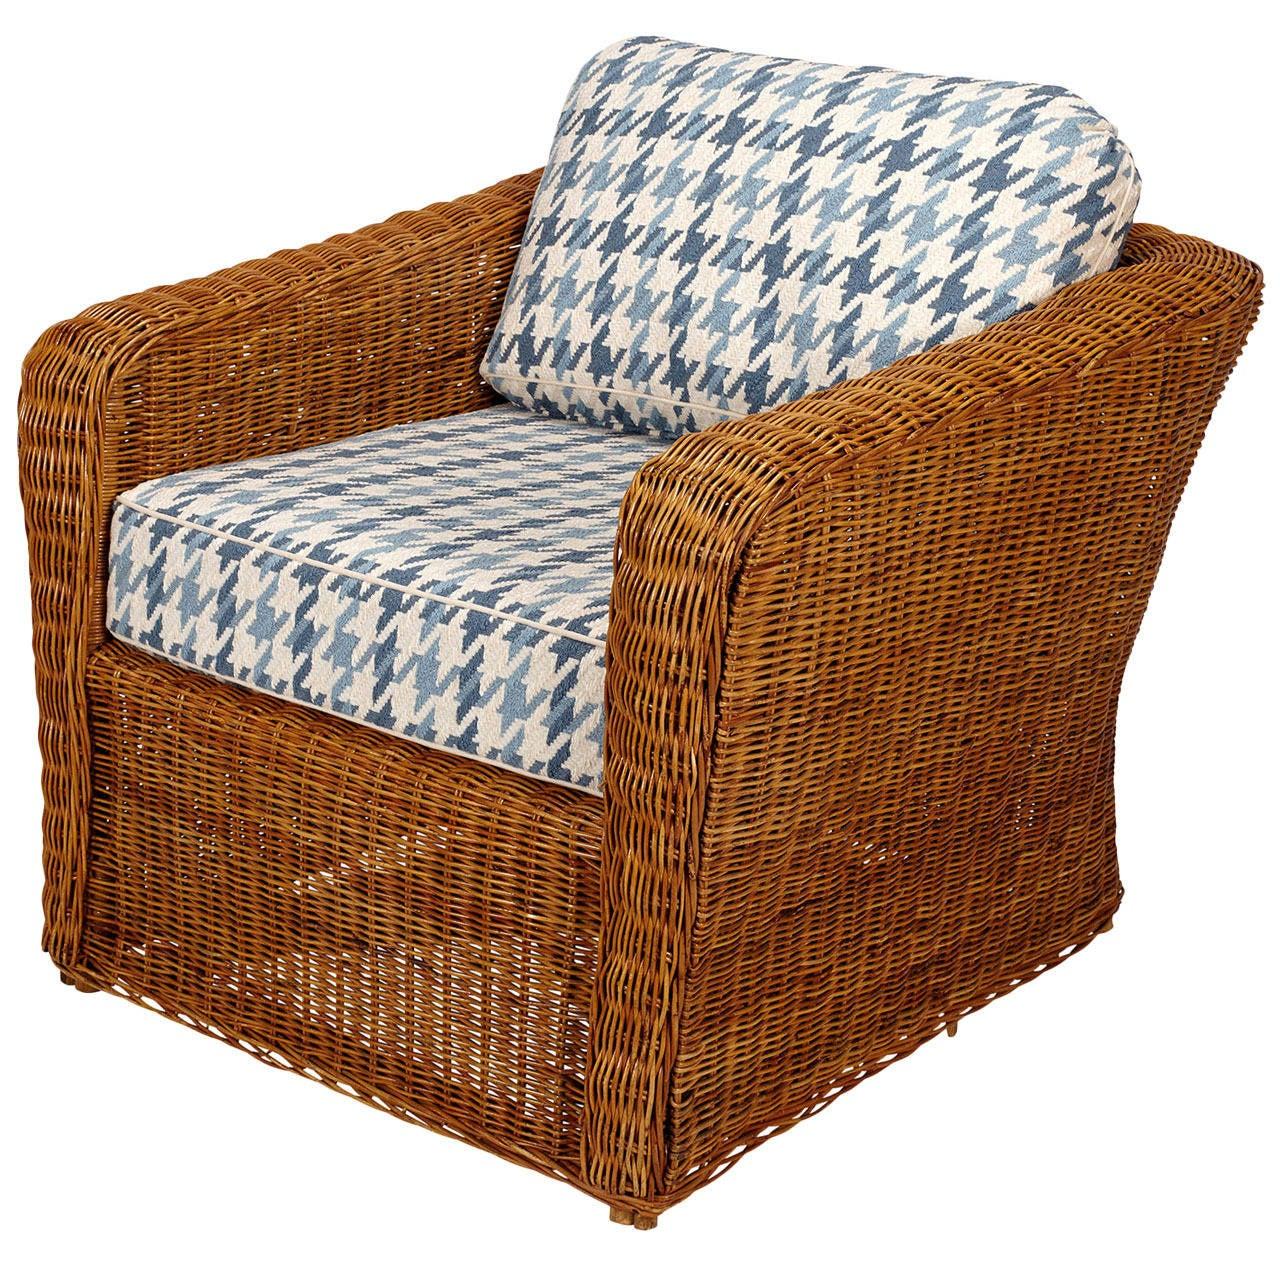 Wicker club chair, 20th century